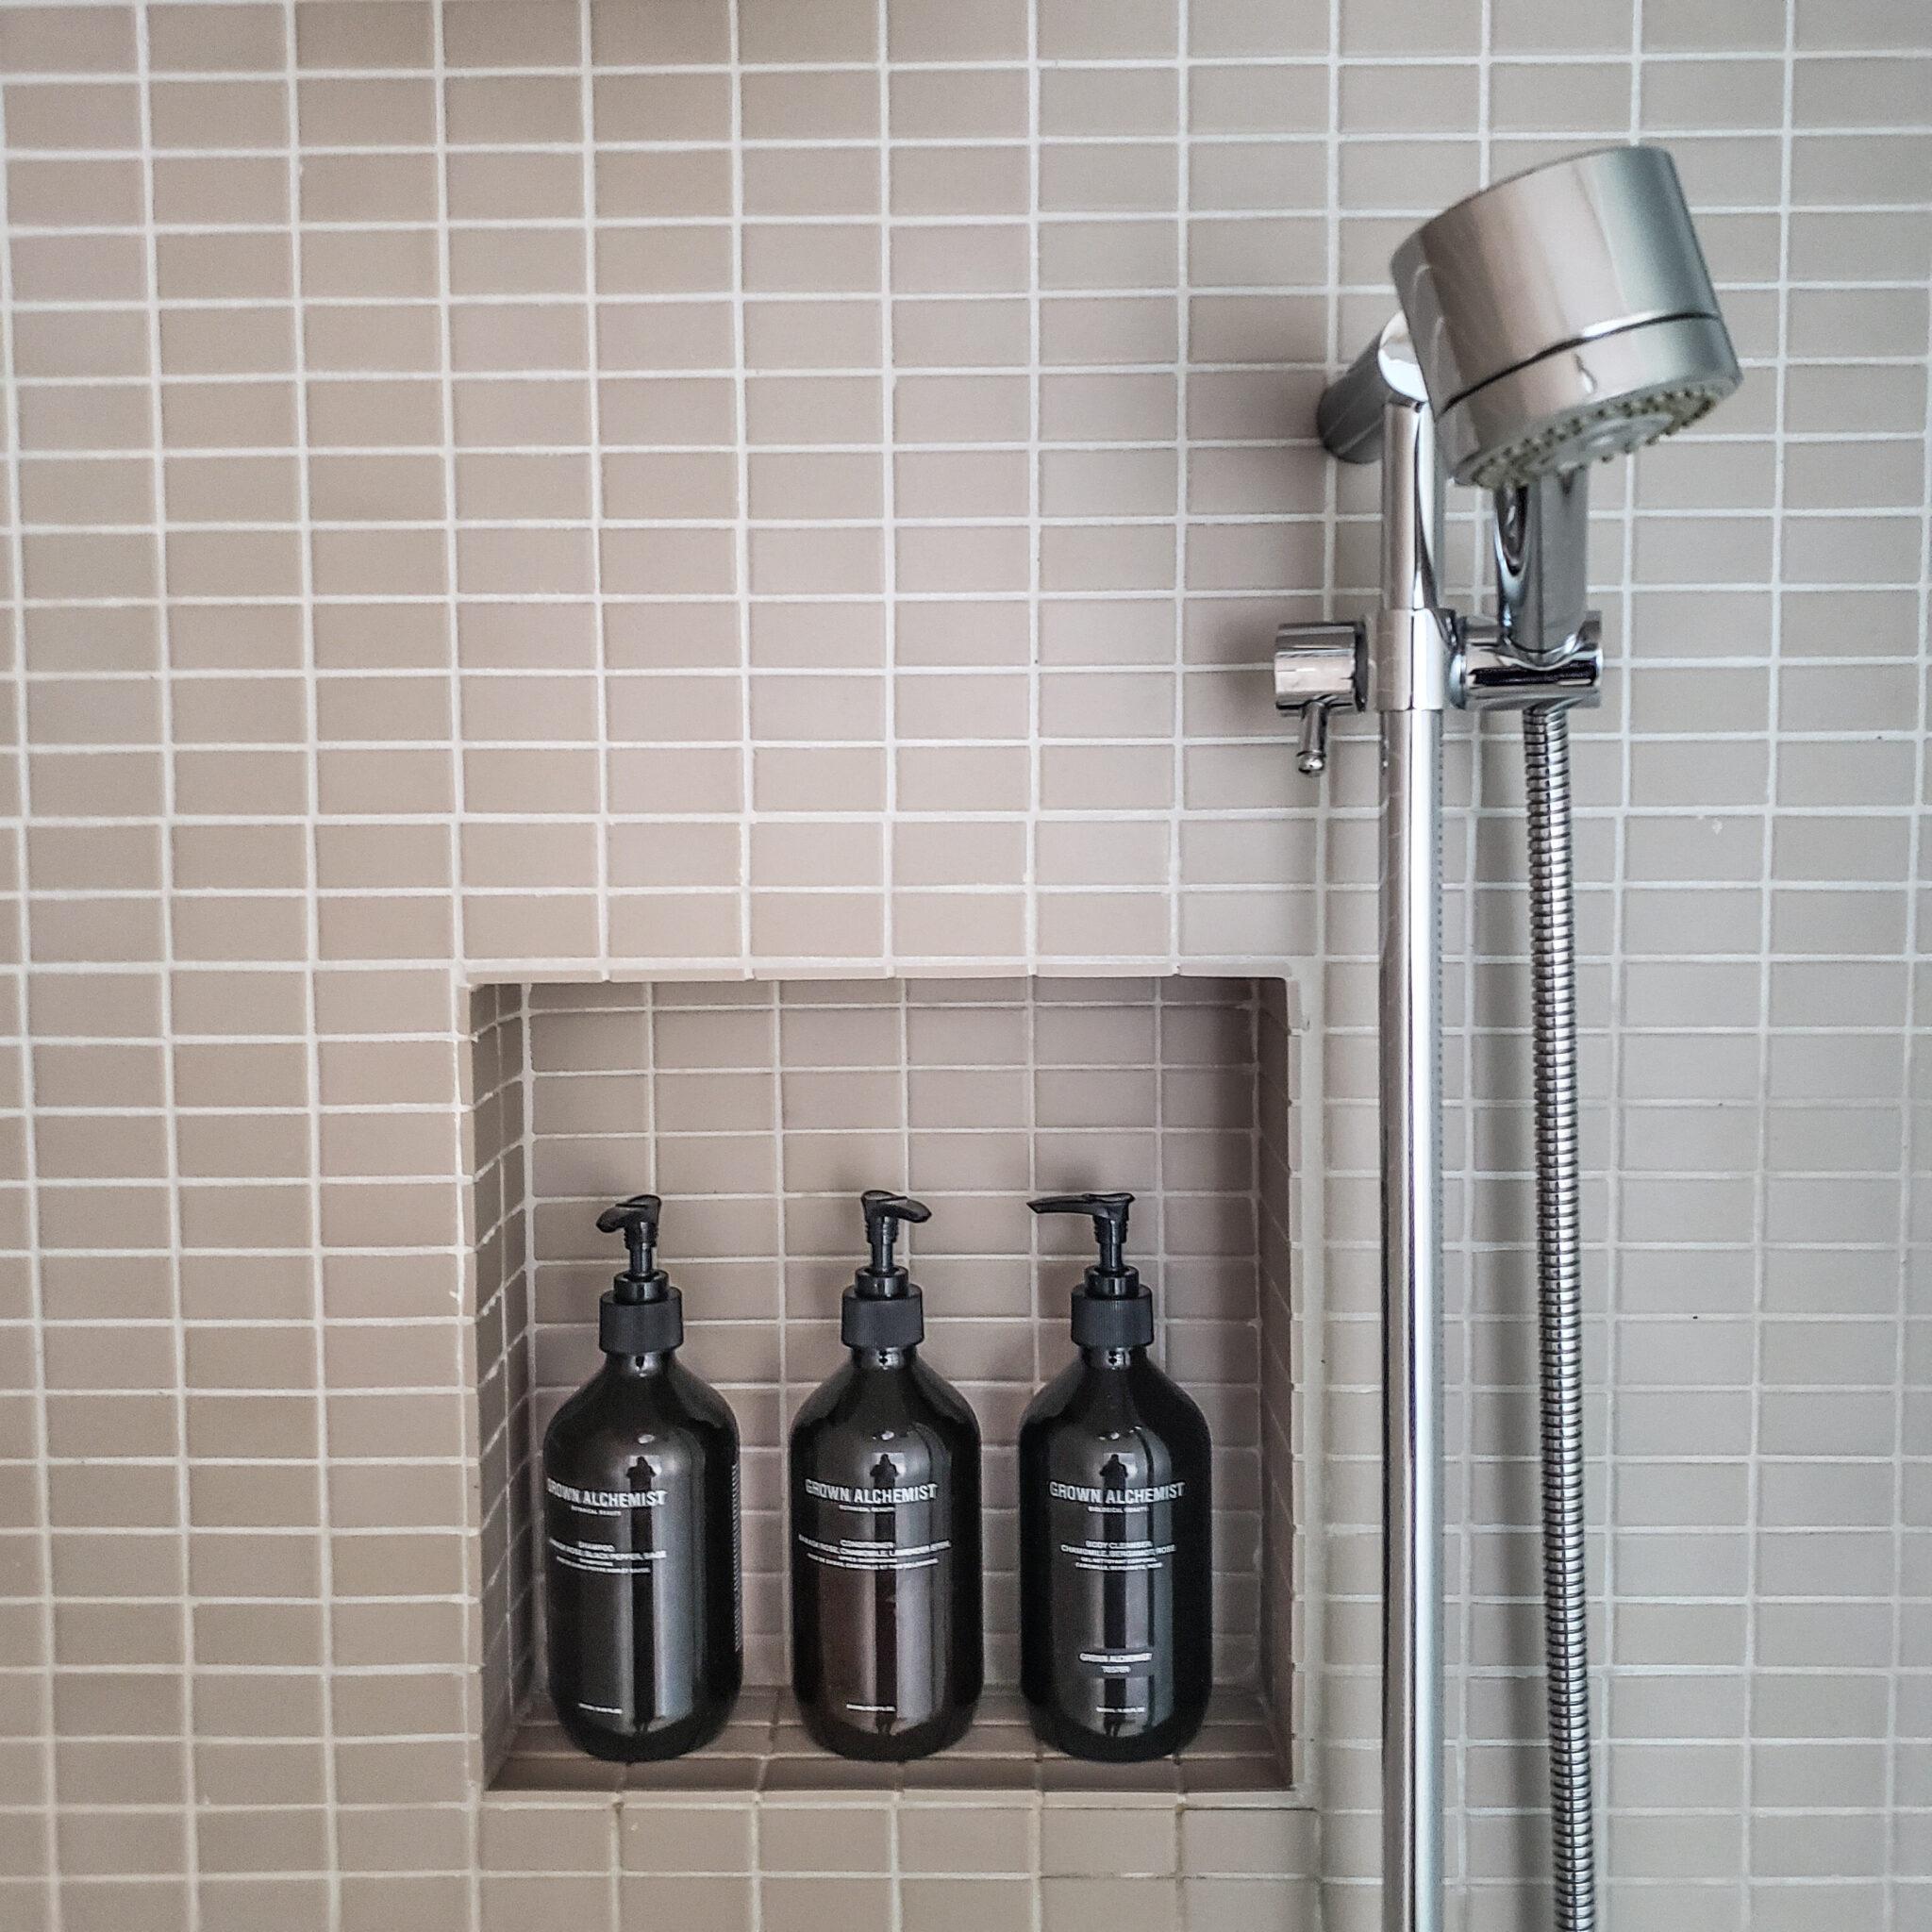 Annex Hotel - The Annex Toronto - Boutique Hotel - Room - Bath Products